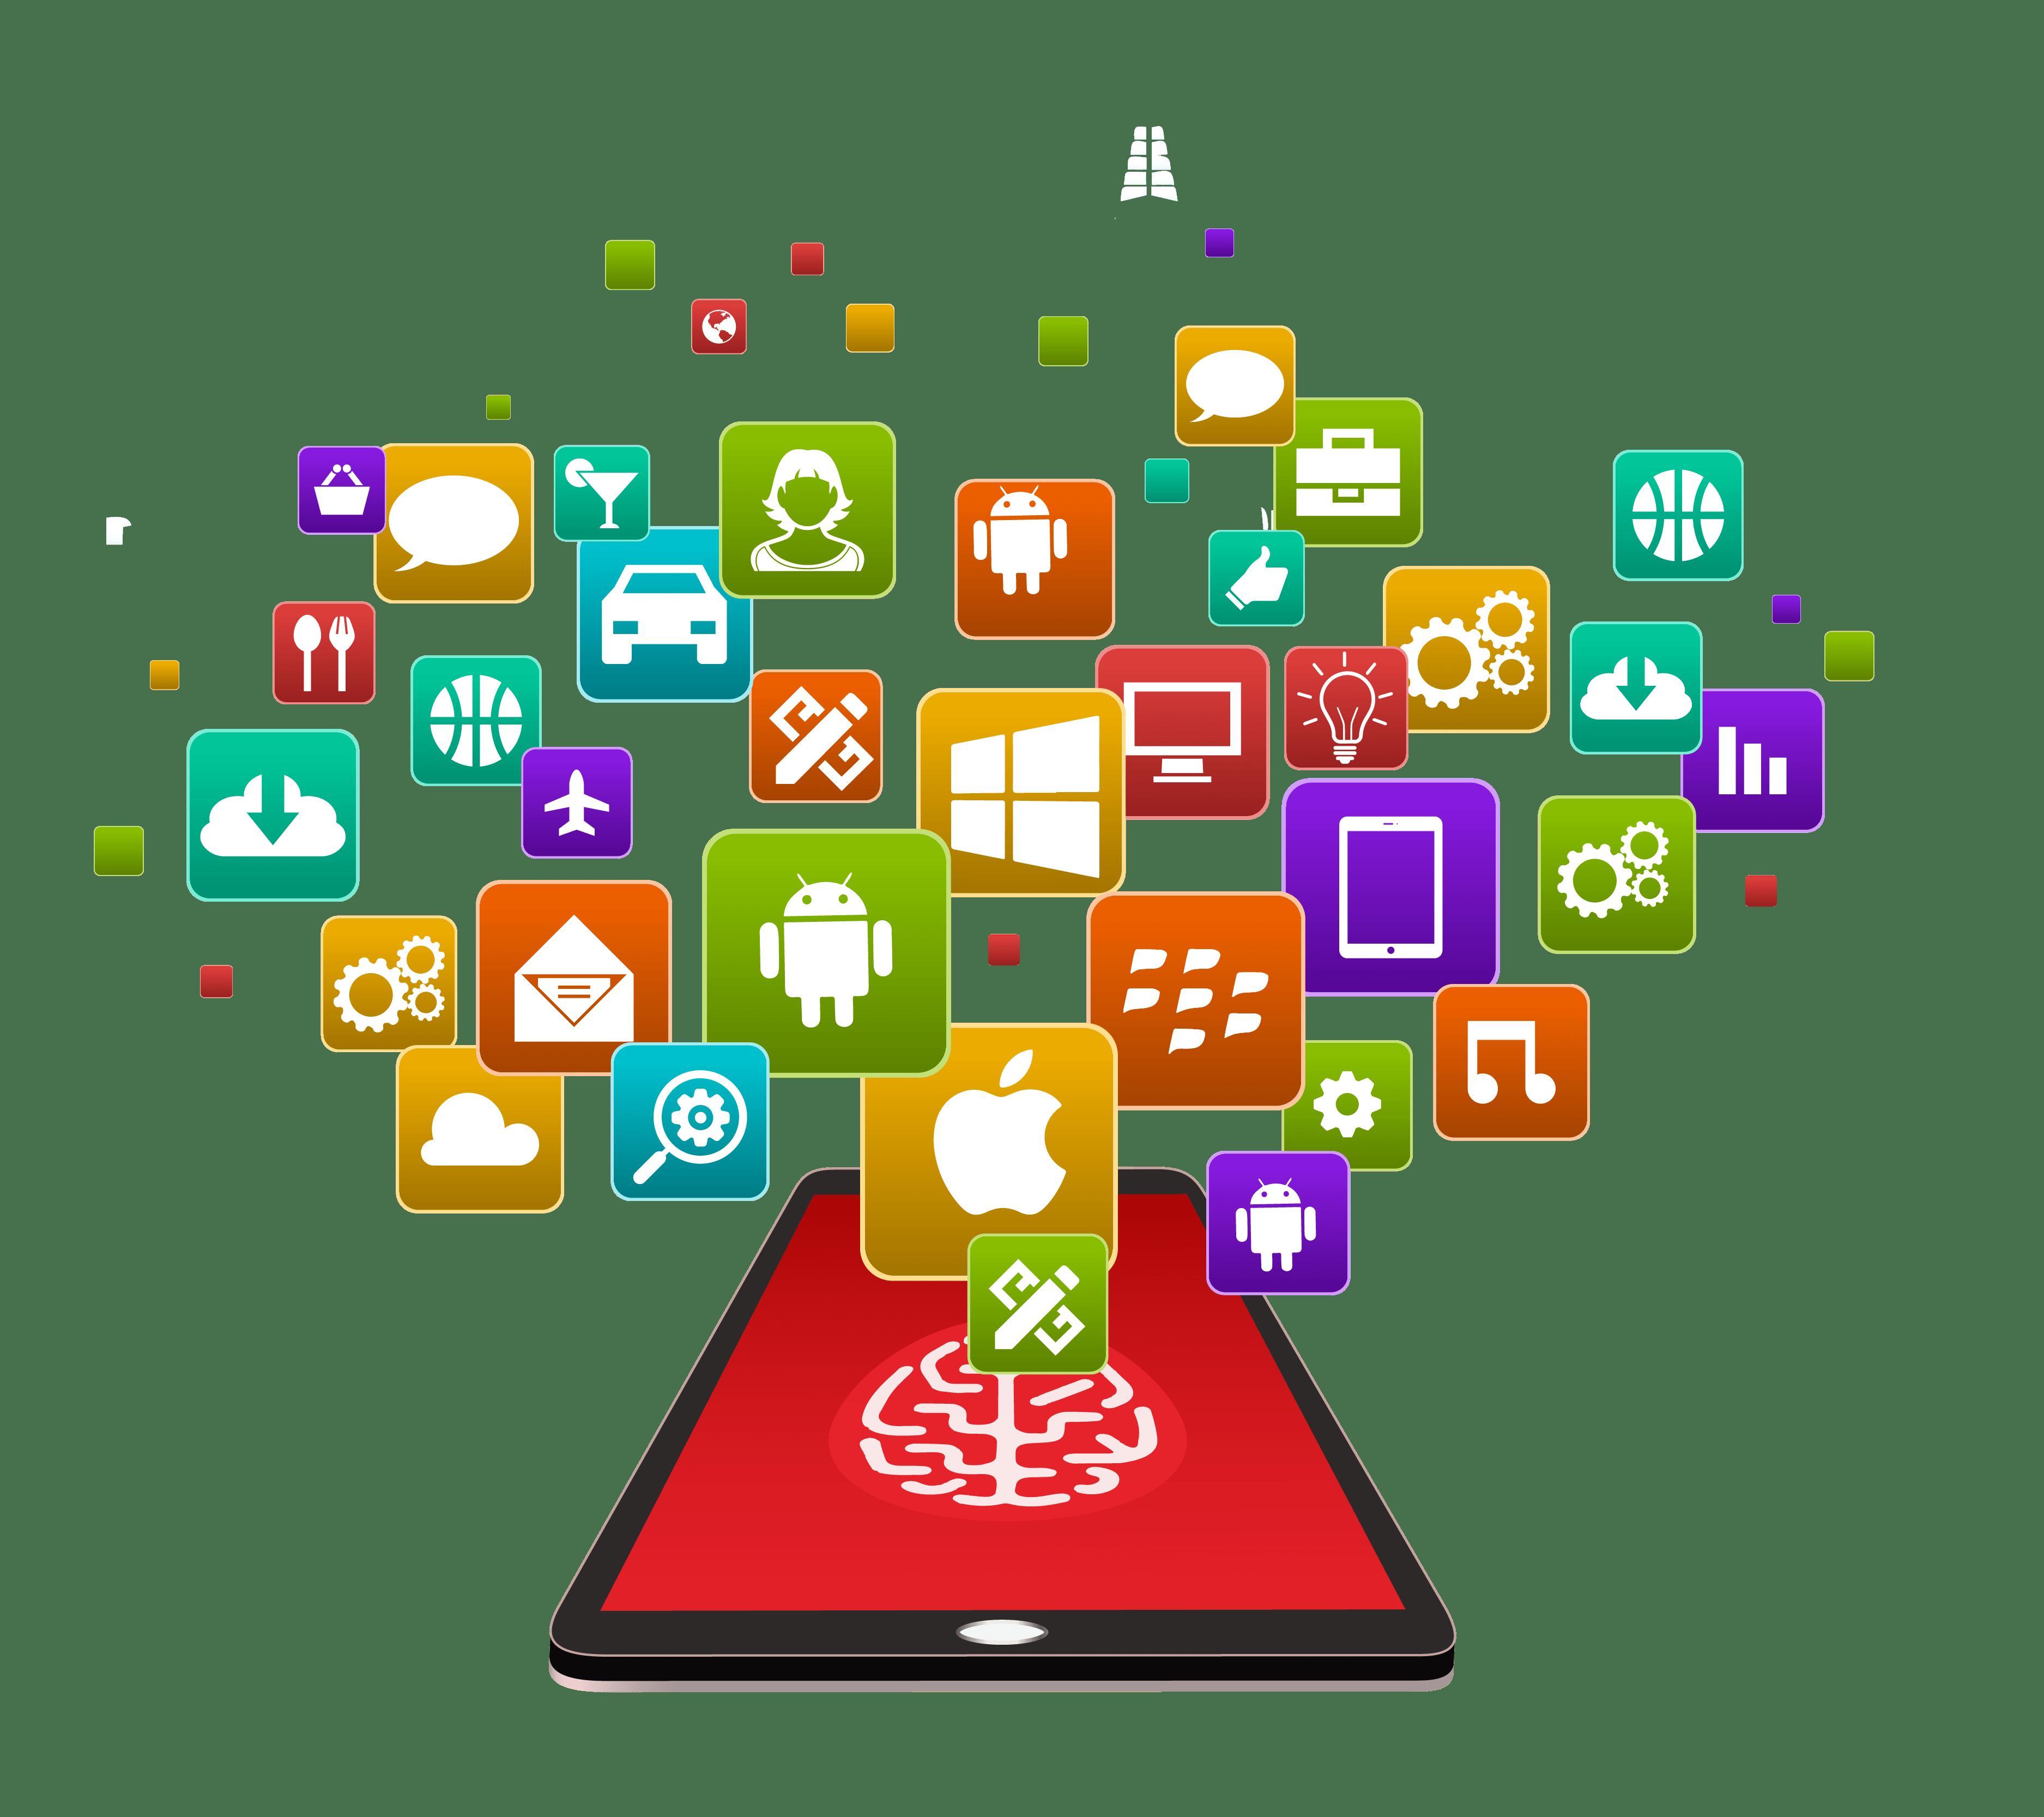 Top 5 Tech Trends For Mobile App Development Company